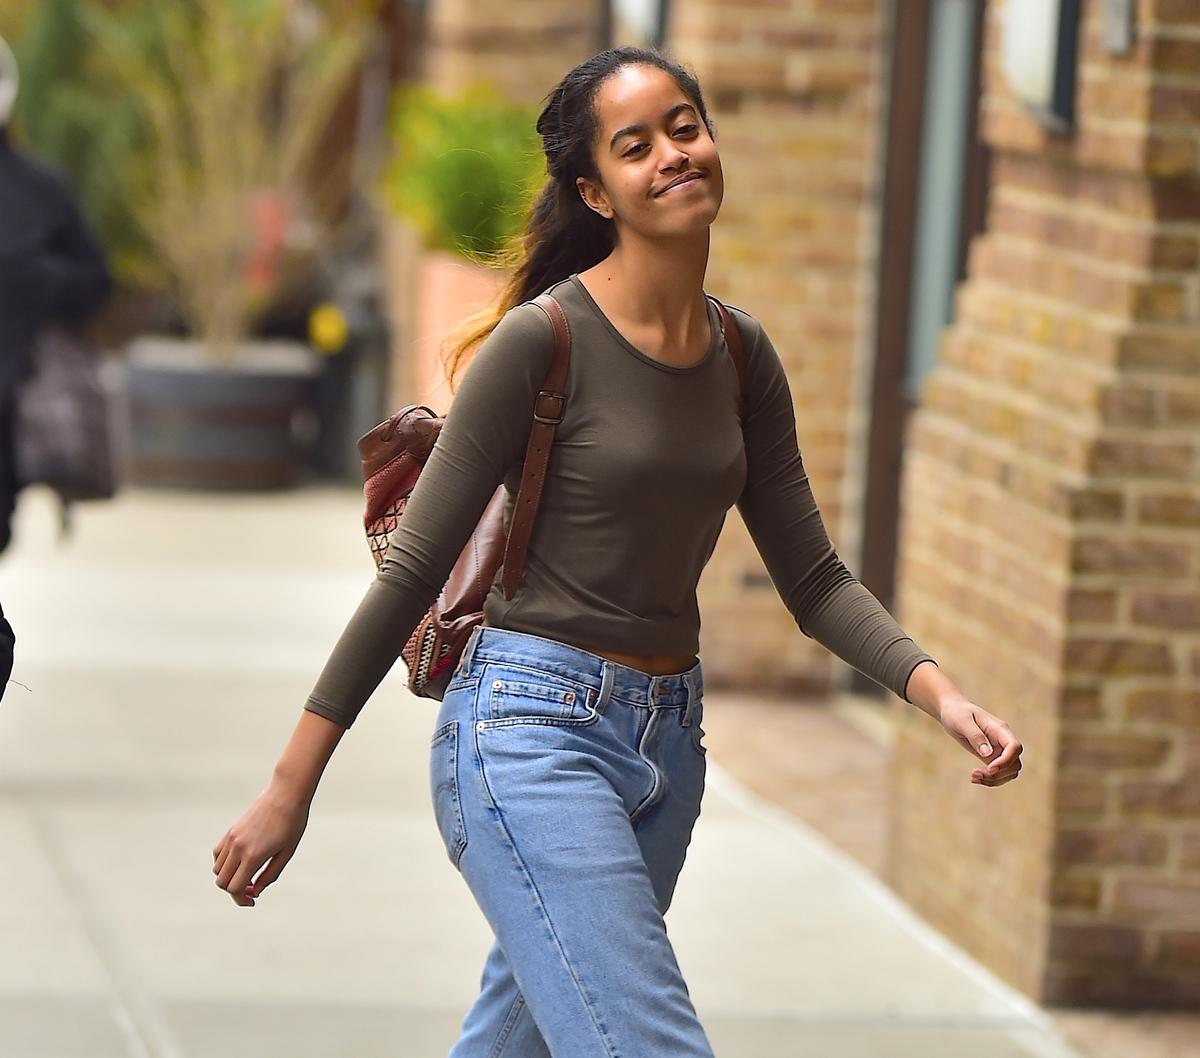 Malia Obama walking alone in Tribeca